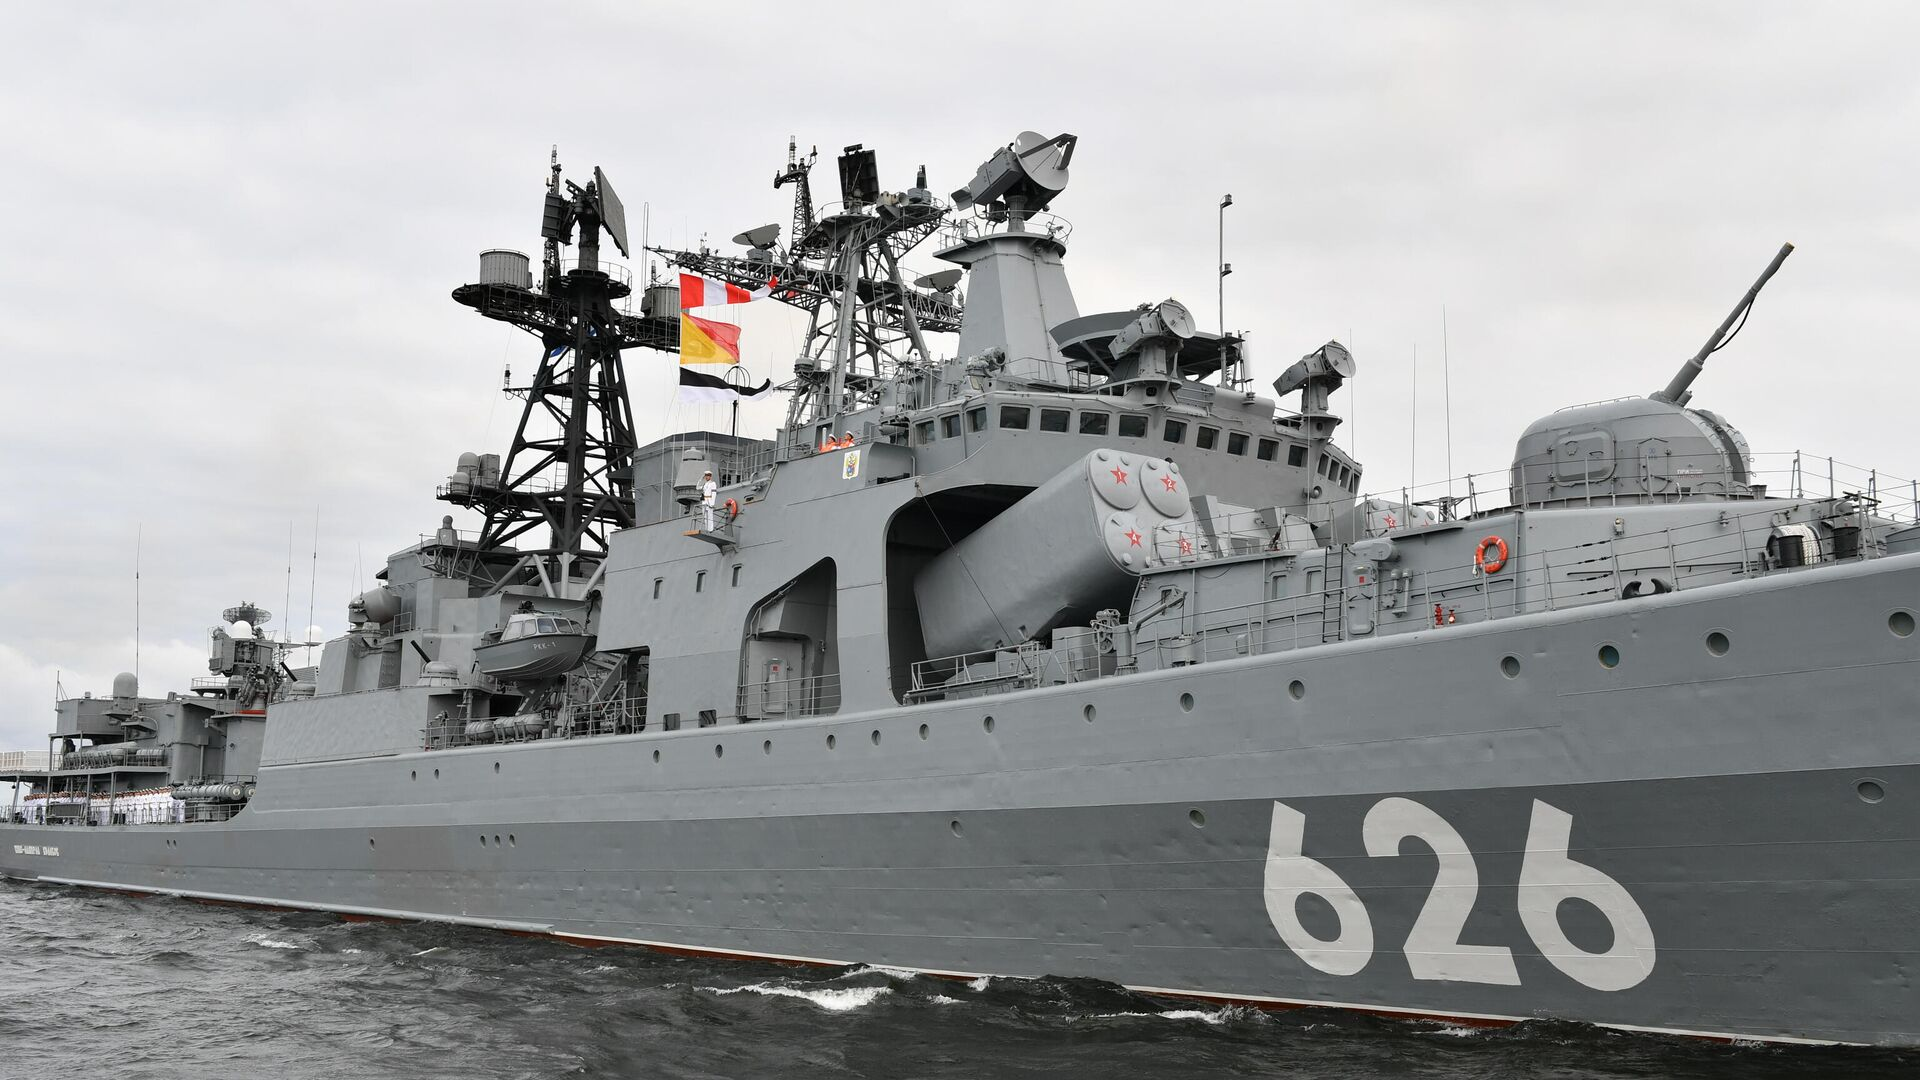 El buque antisubmarino ruso Vicealmirante Kulakov  - Sputnik Mundo, 1920, 18.08.2021